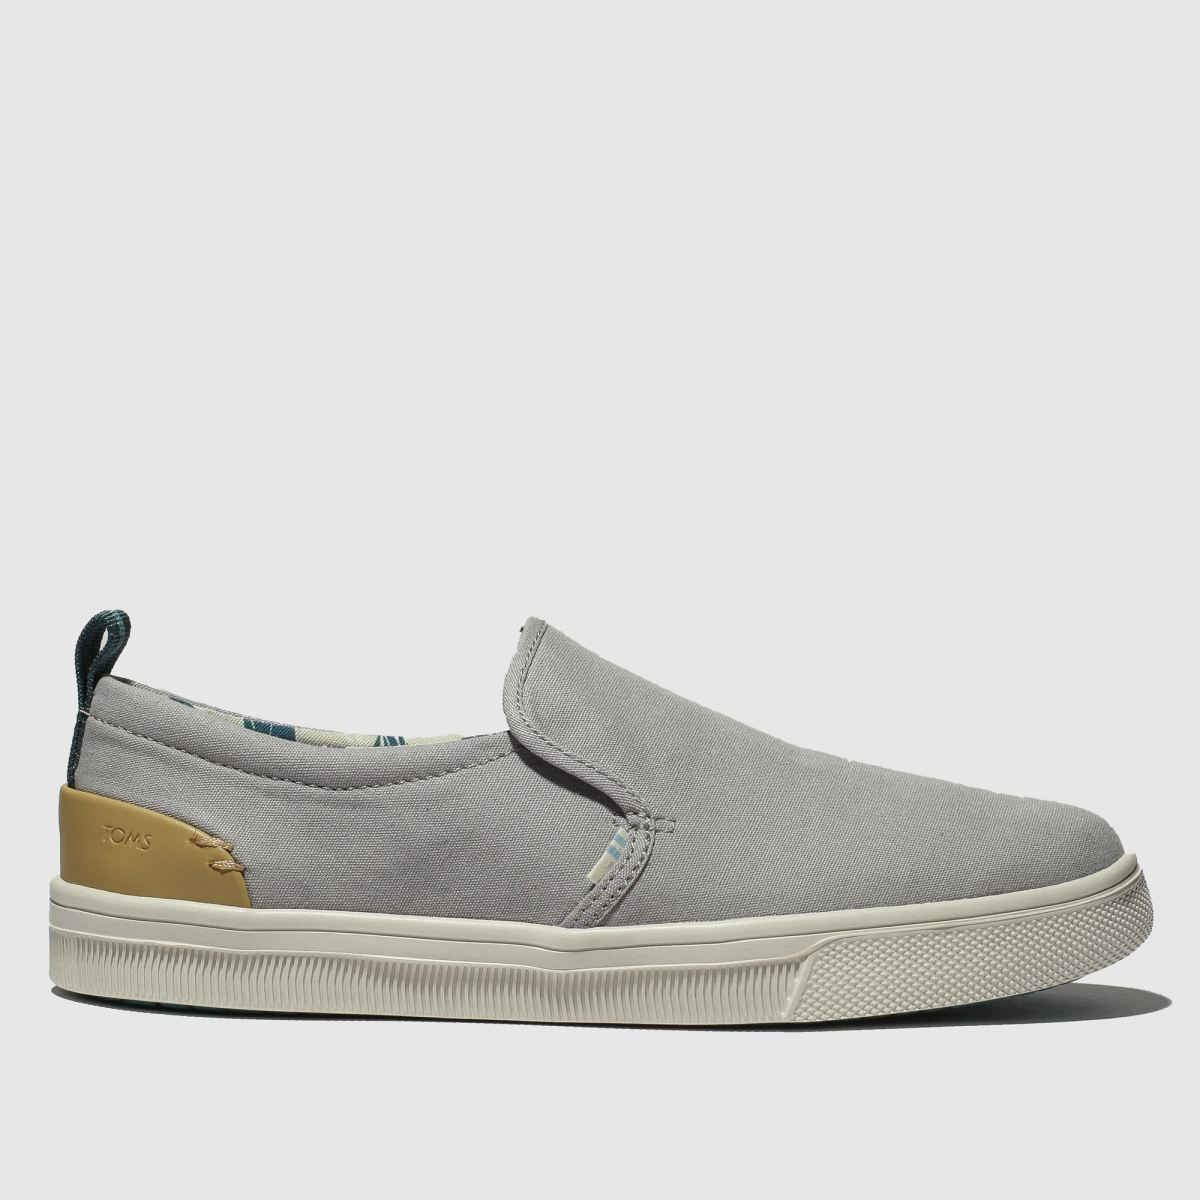 Toms Light Grey Trvl Lite Slip-on Flat Shoes